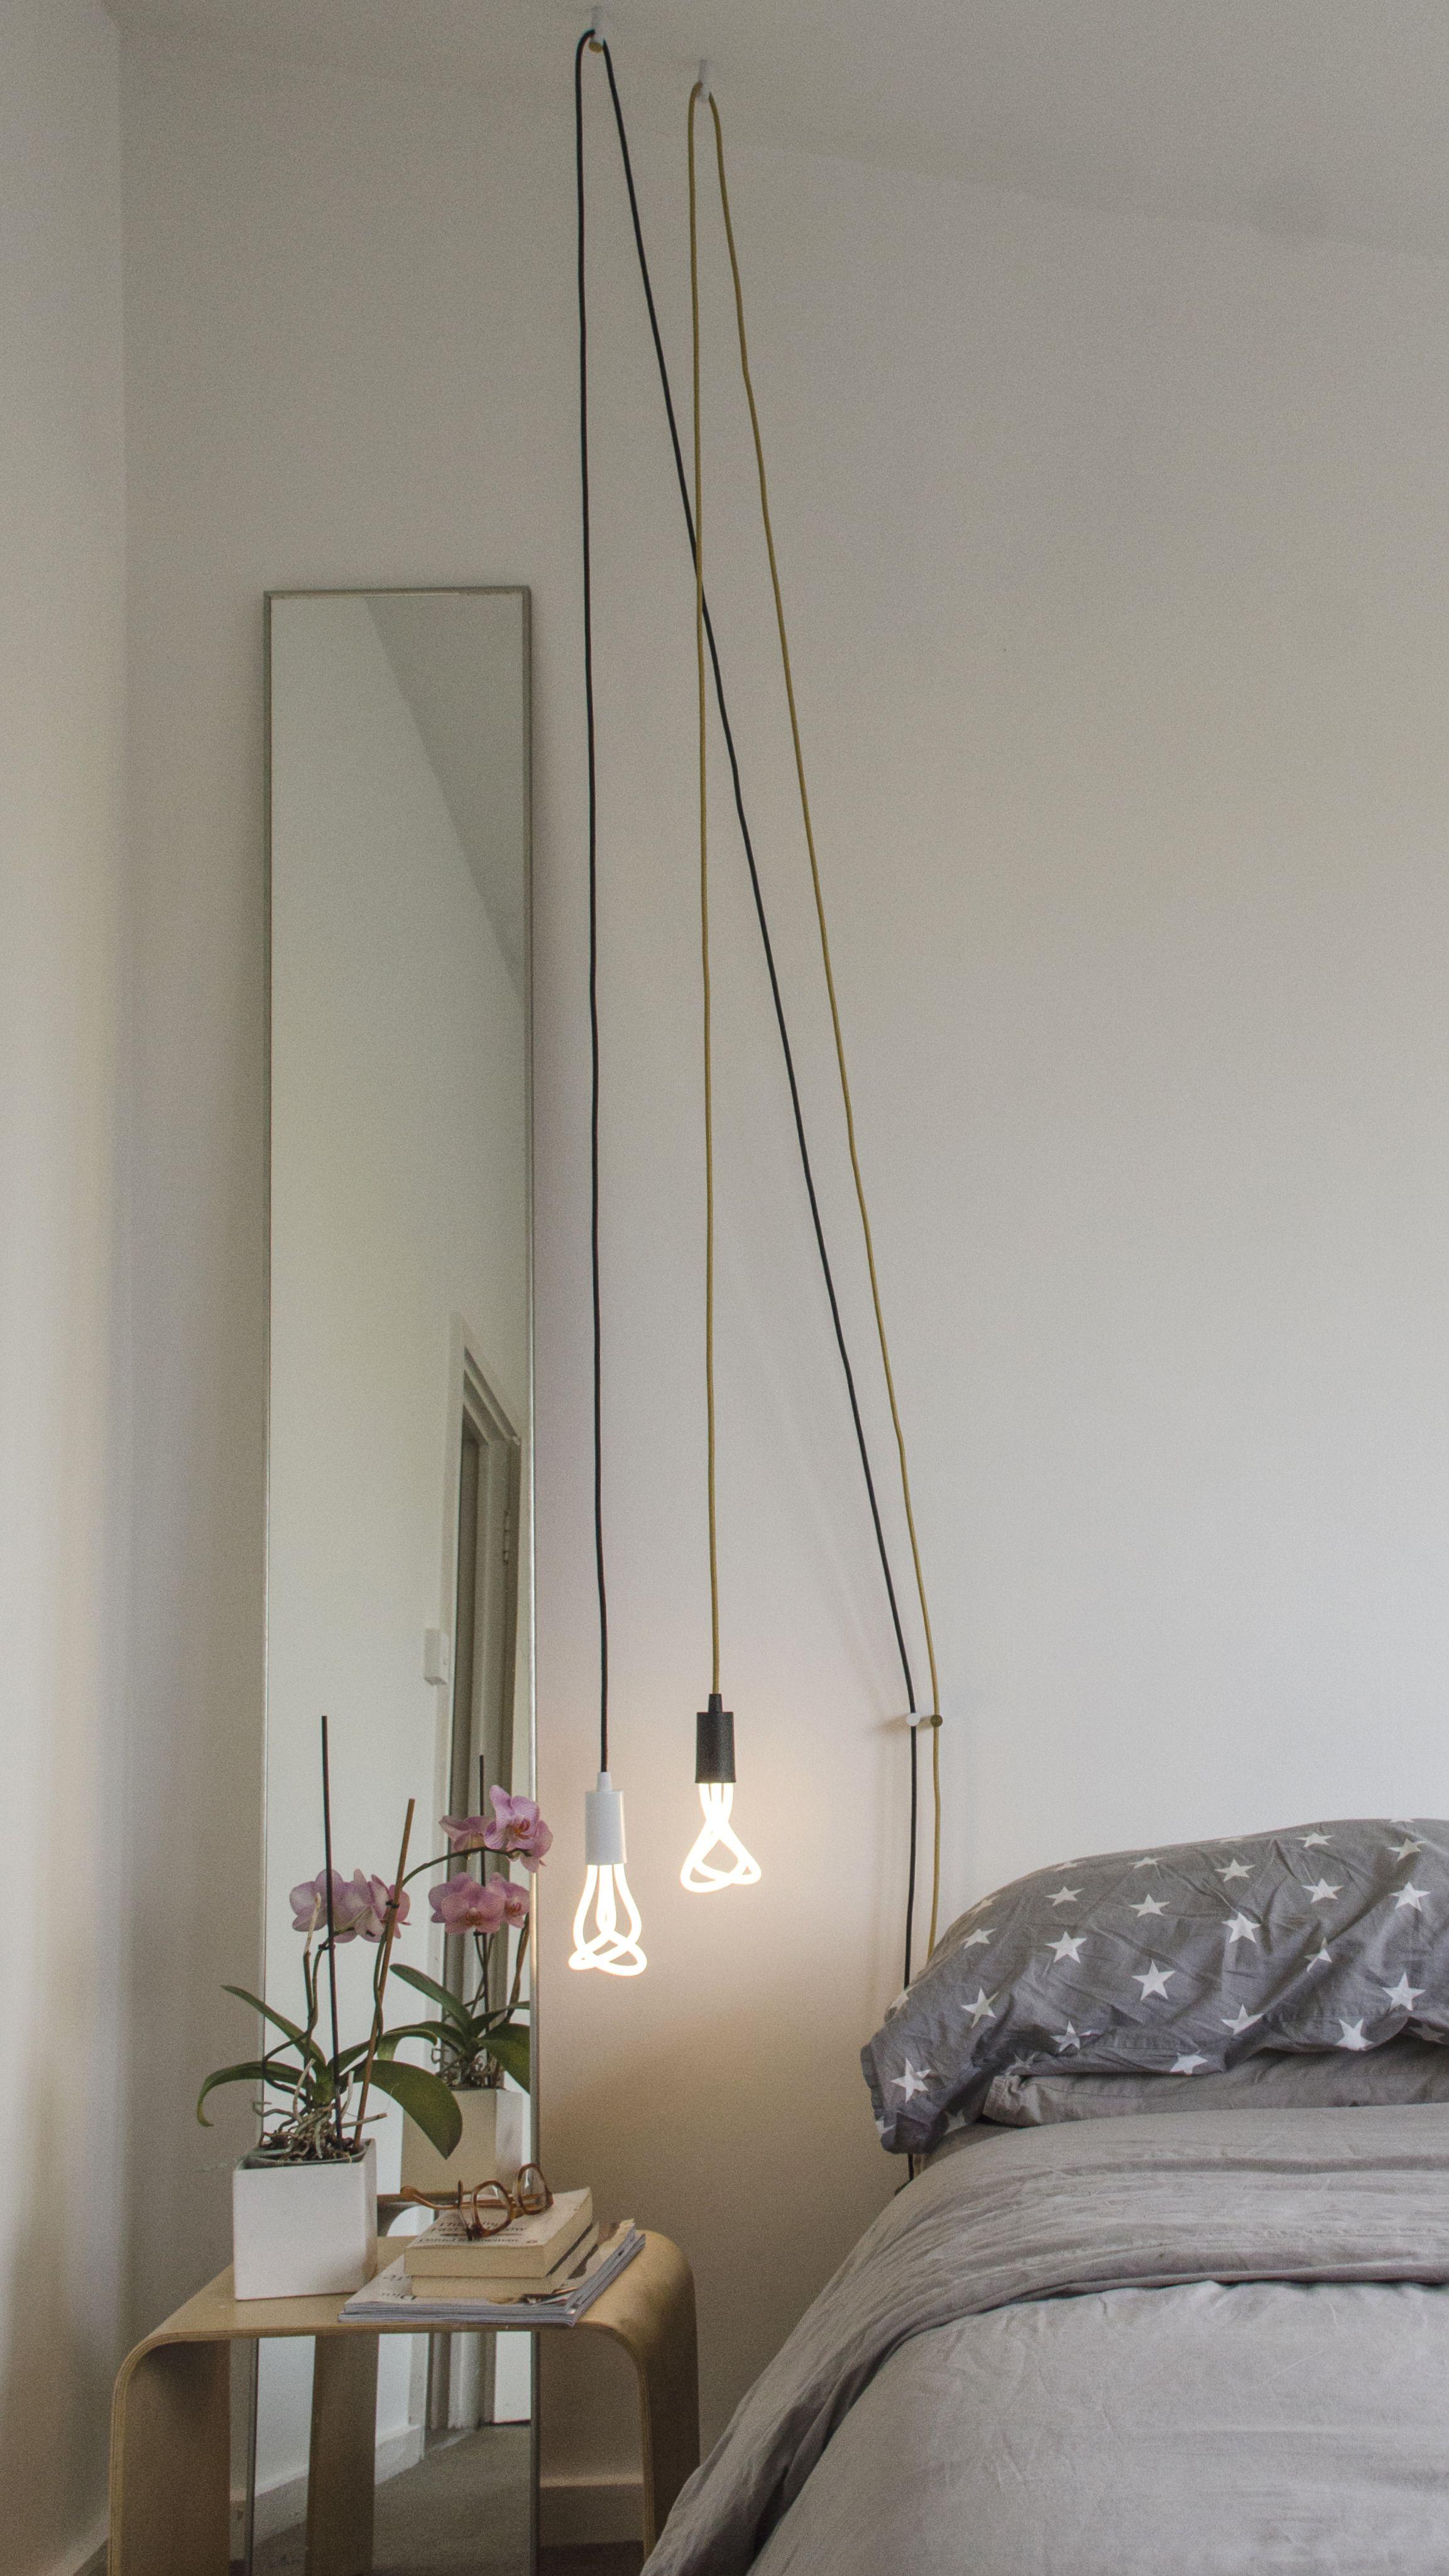 Plumen 001 Led Bulb And Plumen Pendant Set Bedside Lighting